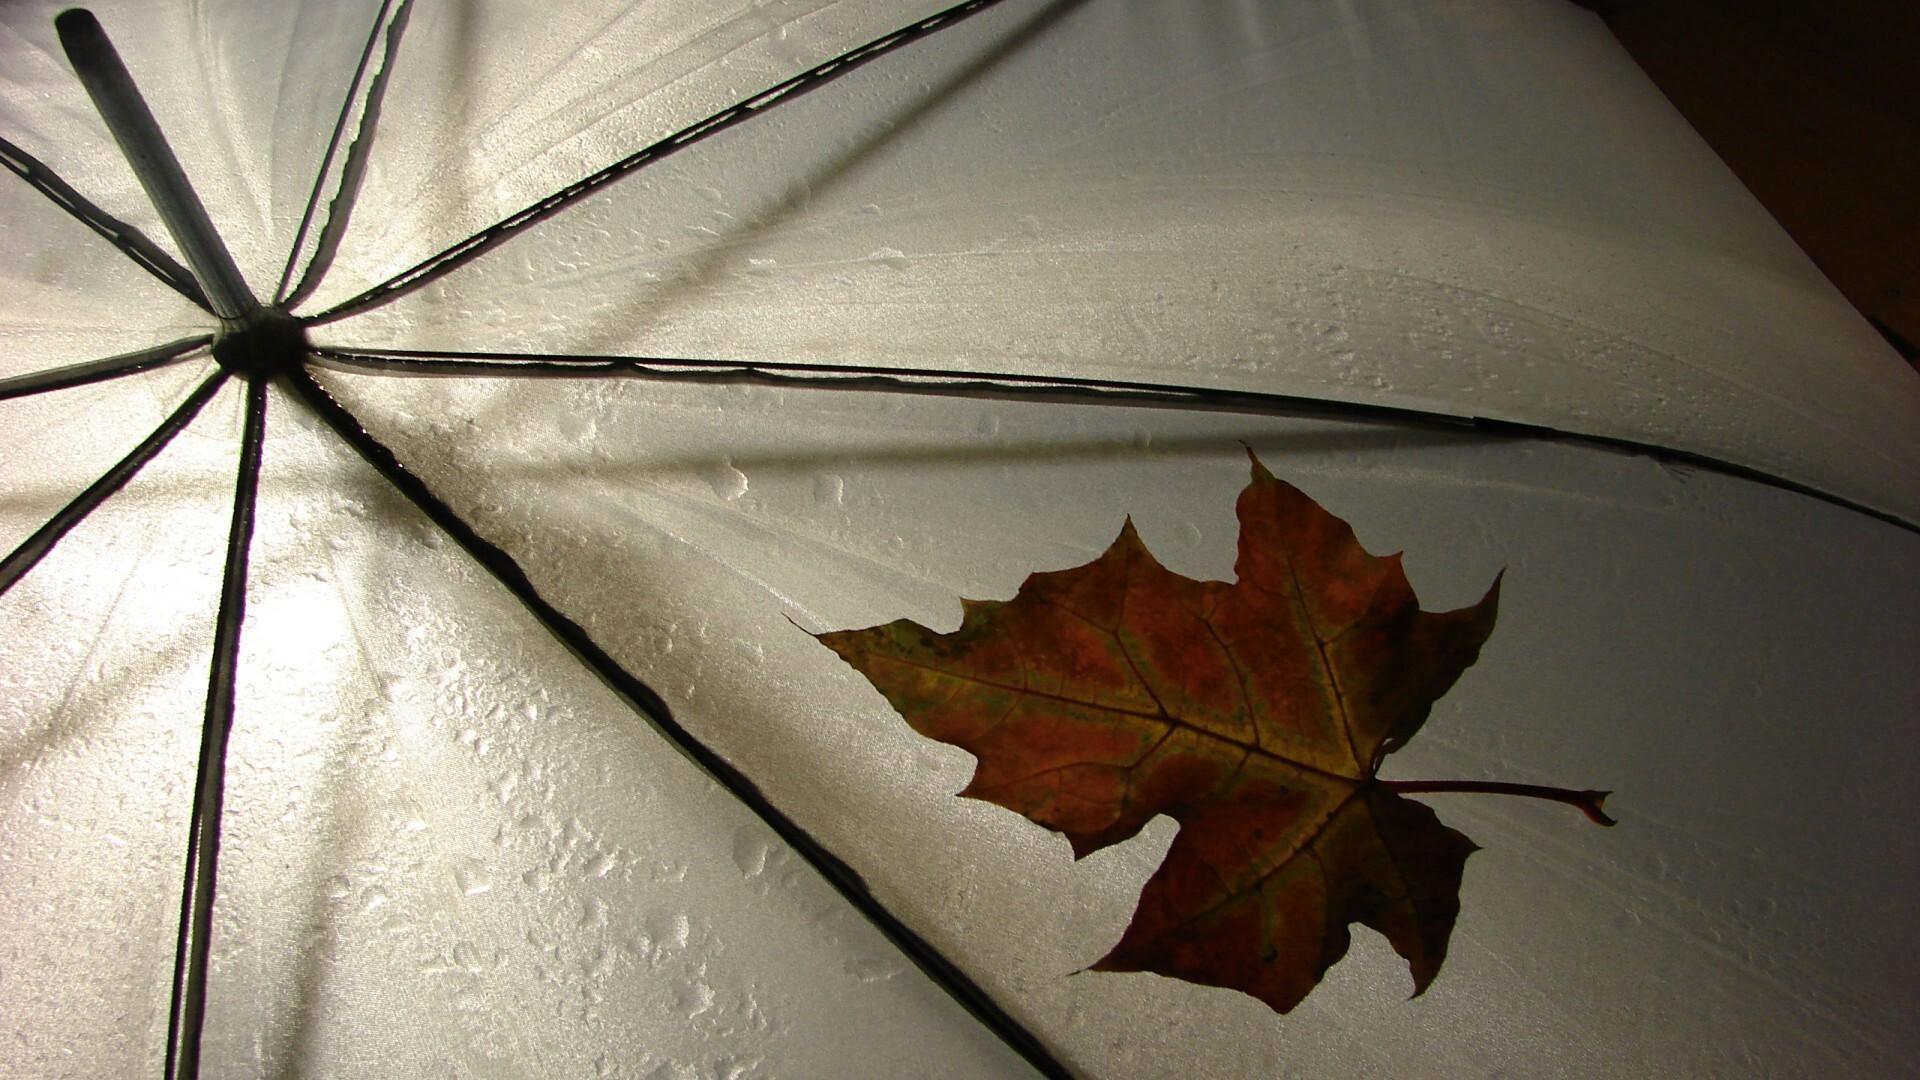 Leaf On Umbrella Rain Wallpaper Hd Wallpapers